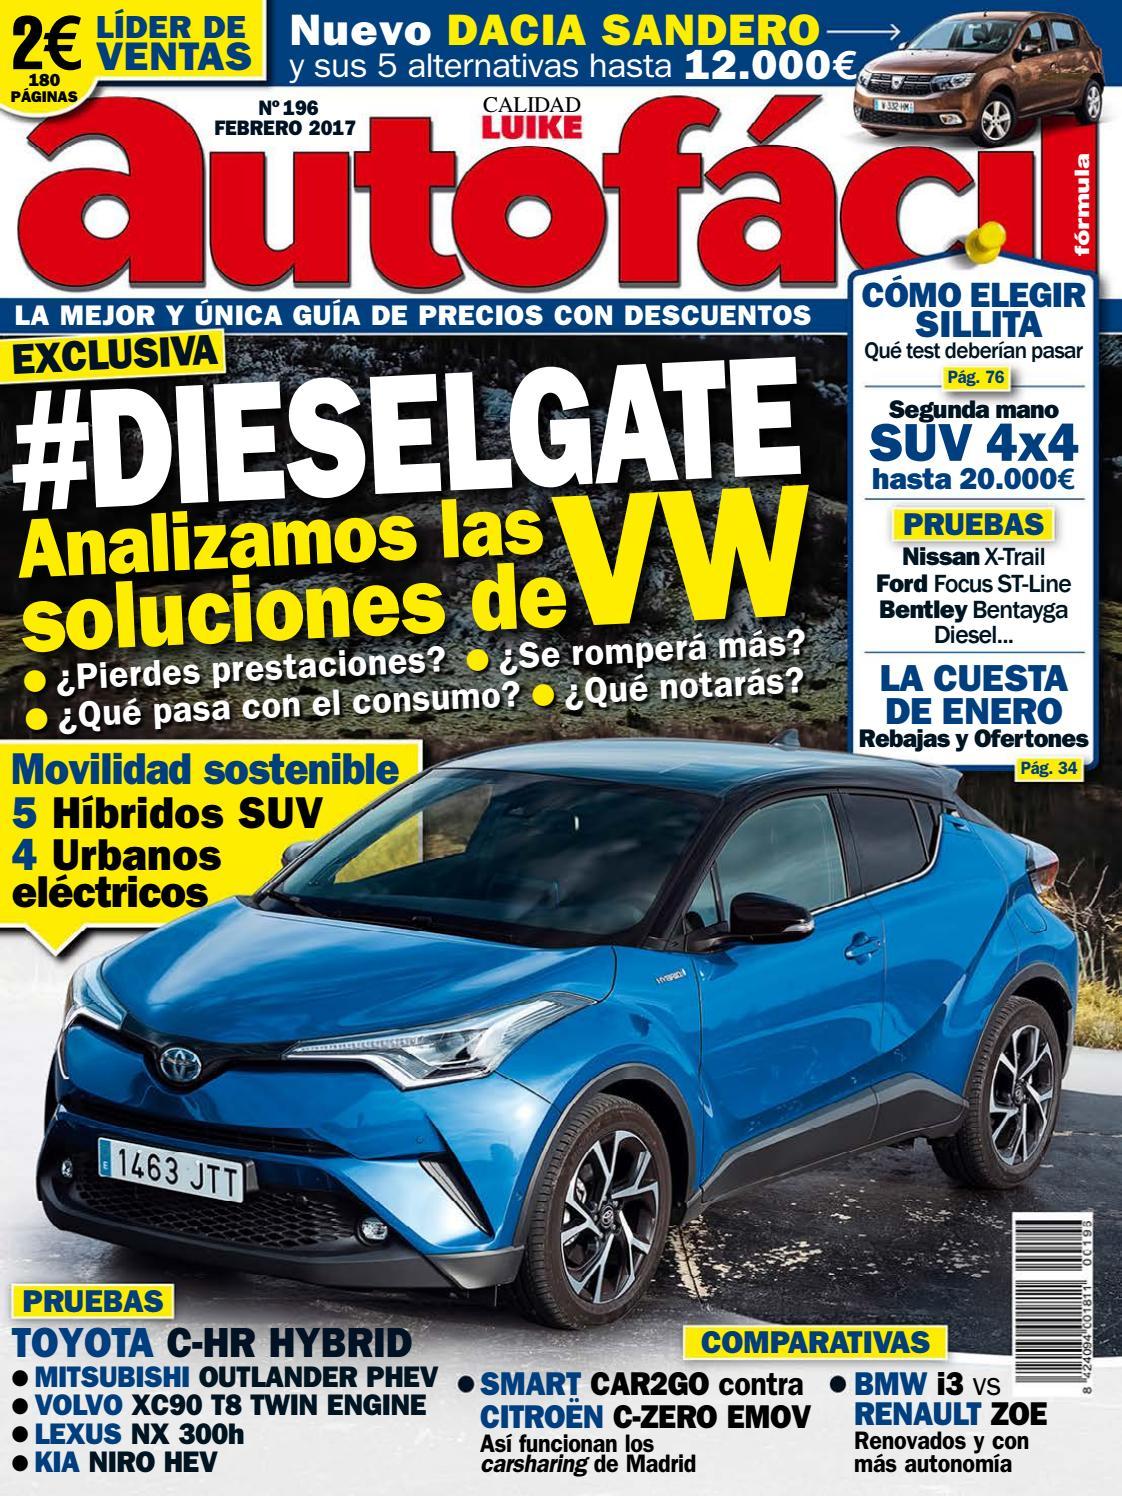 Autofácil Nº 196. Febrero 2017 by LIDER - issuu 5d814d409a1f